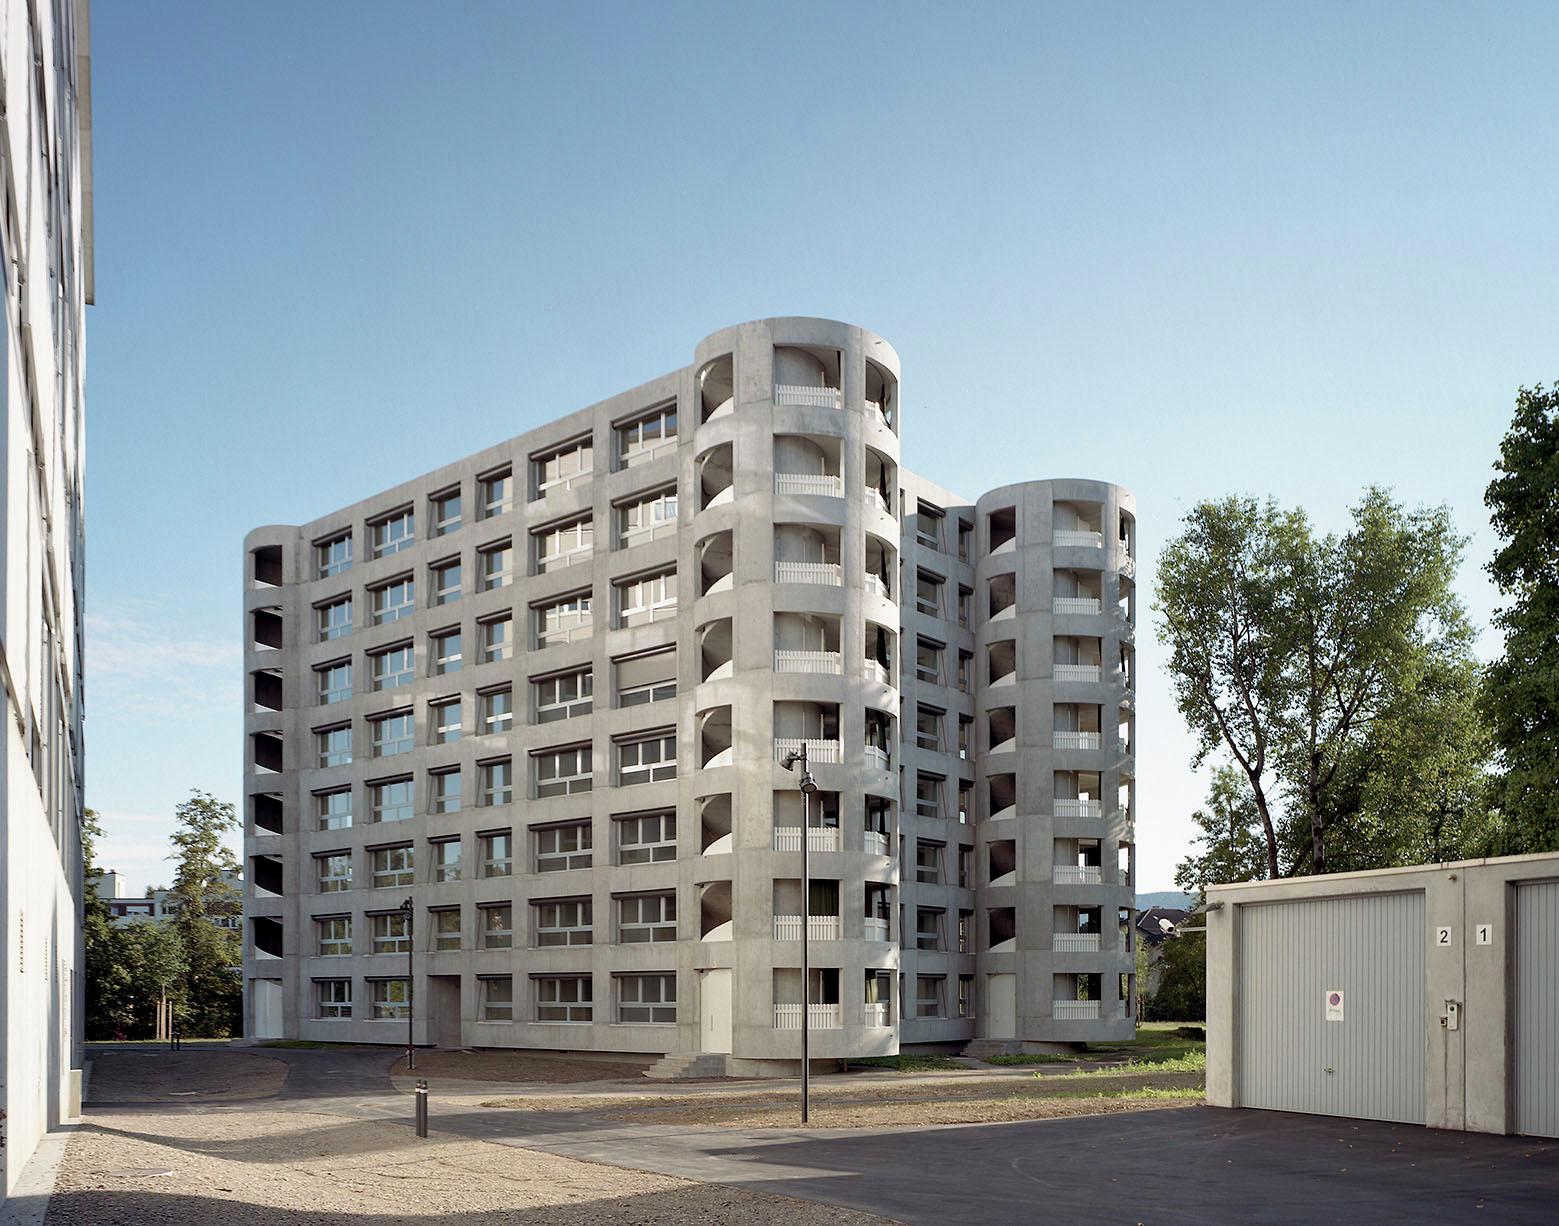 Zellwegerpark uster herzog de meuron archdaily for Architecture 00